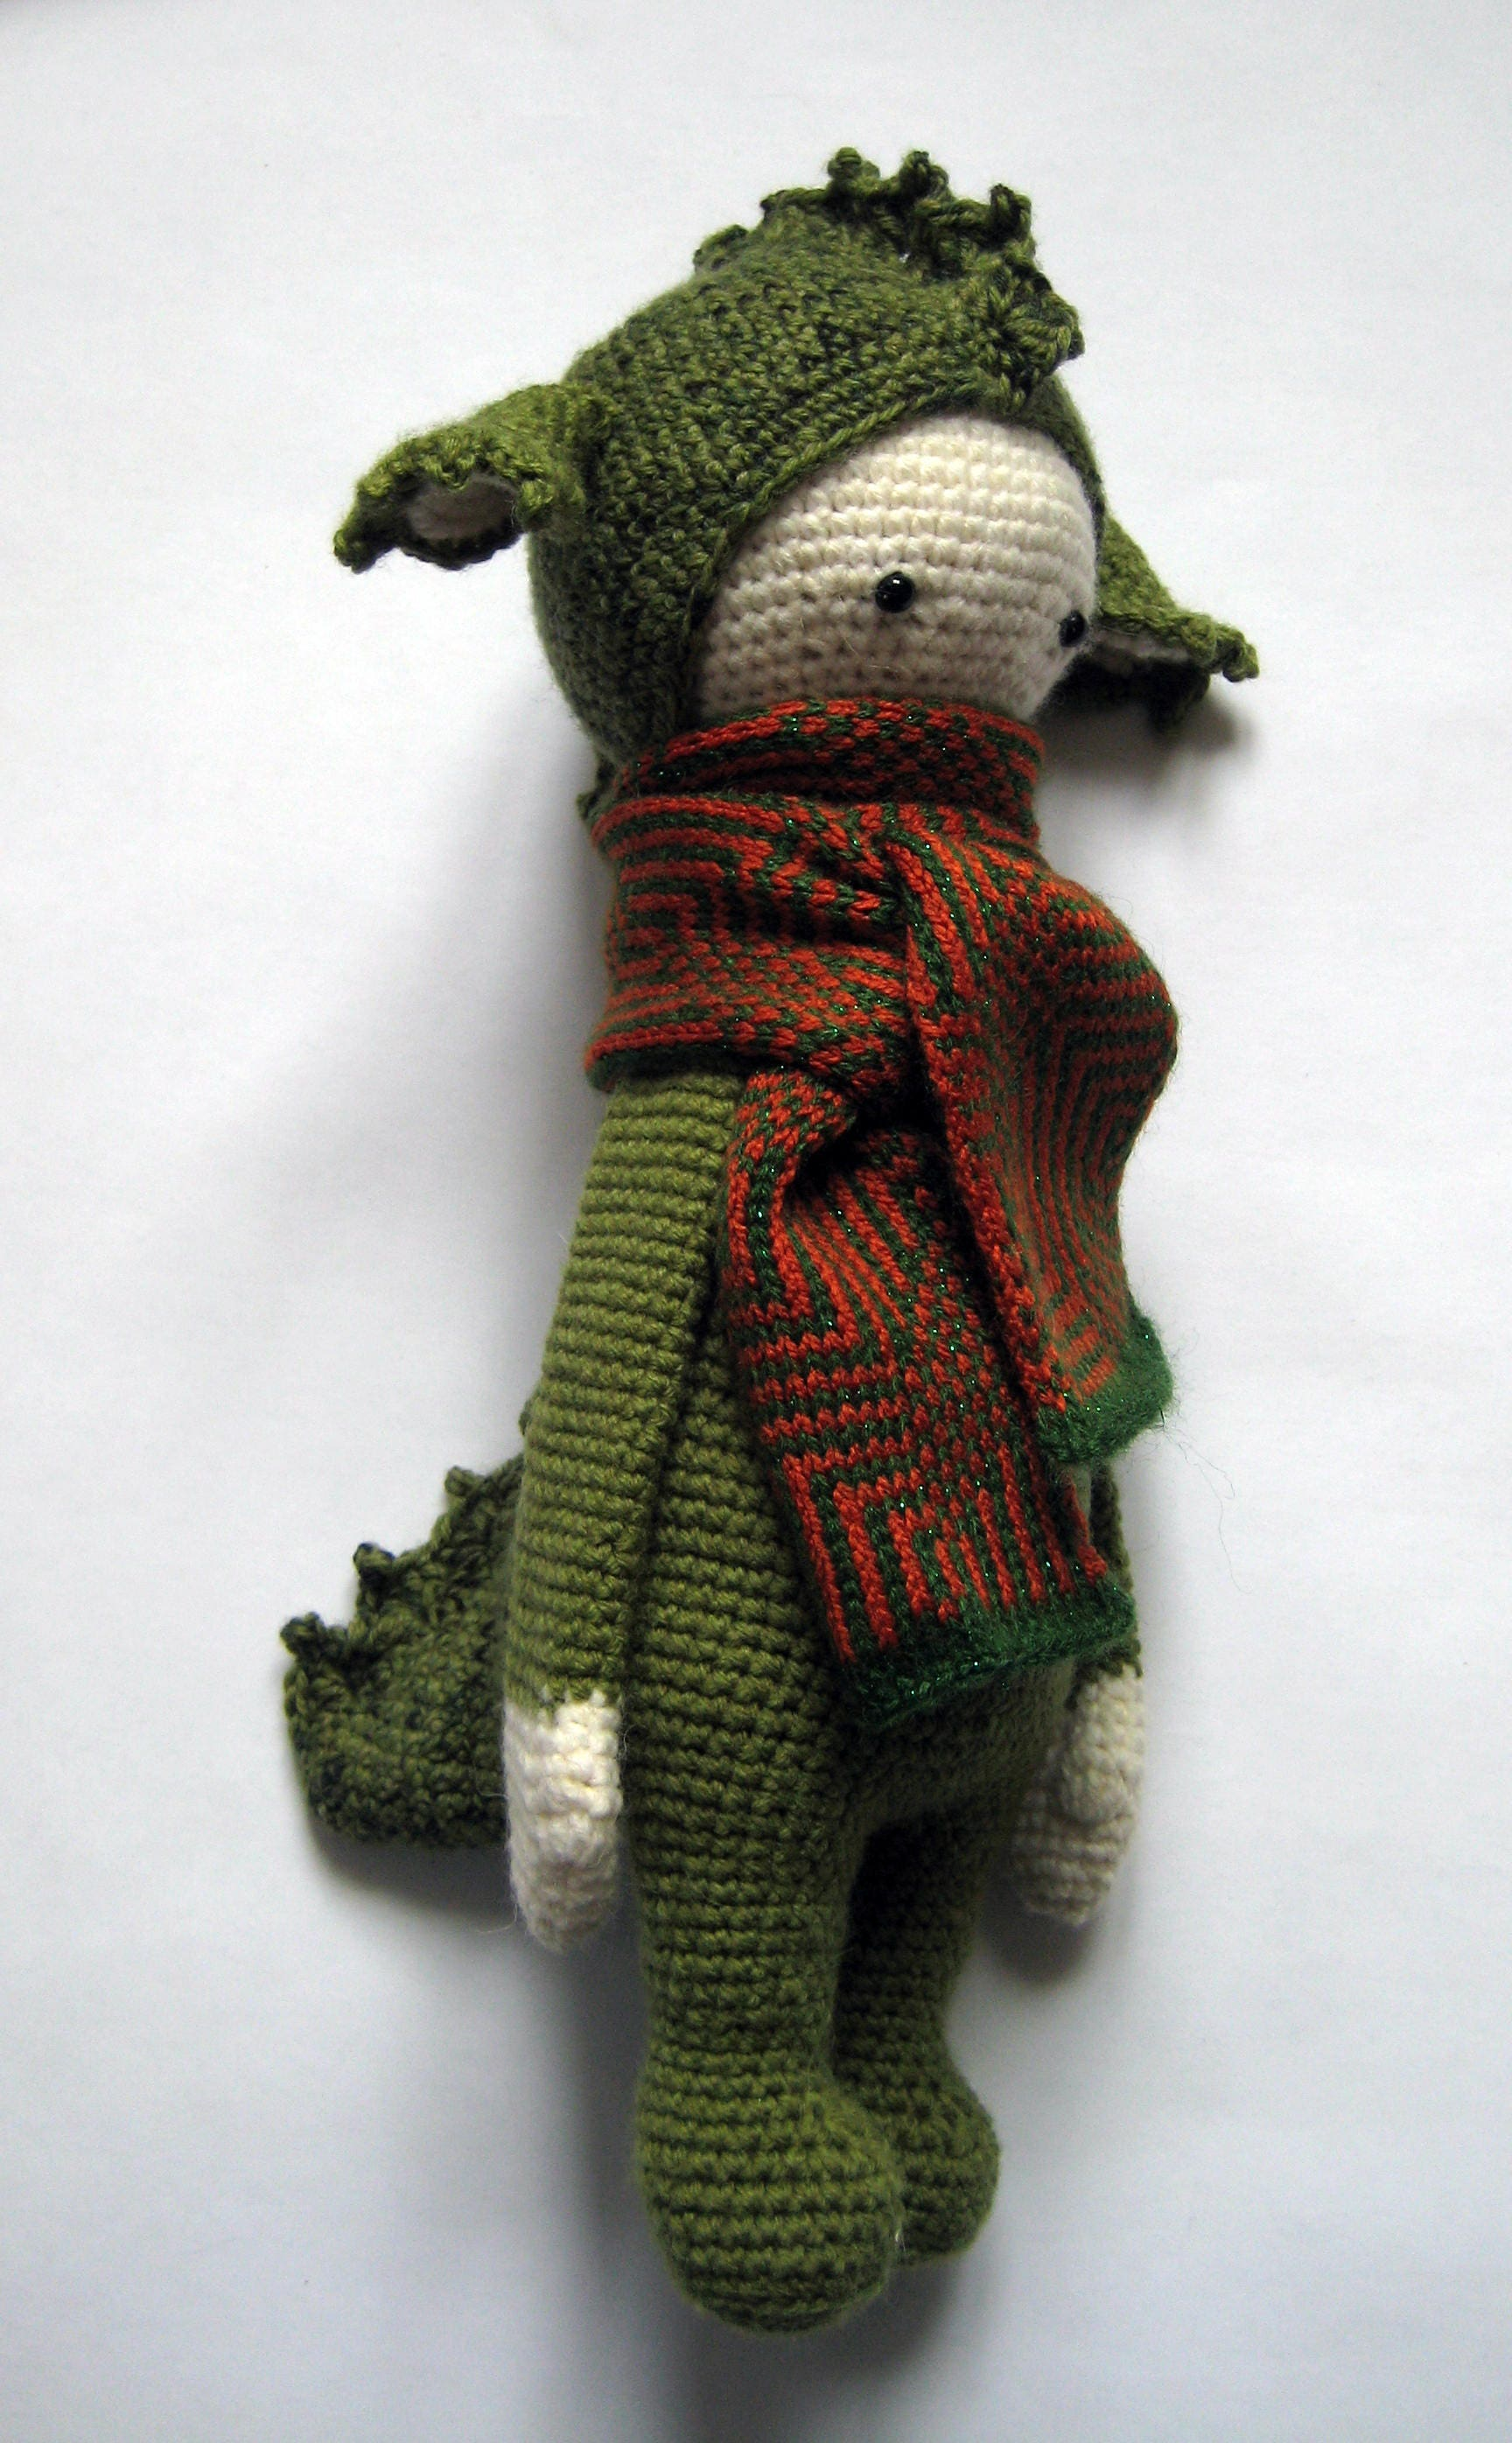 Green Dragon Amigurumi Pattern : Nursery baby gift Green dragon amigurumi Crochet doll Knit